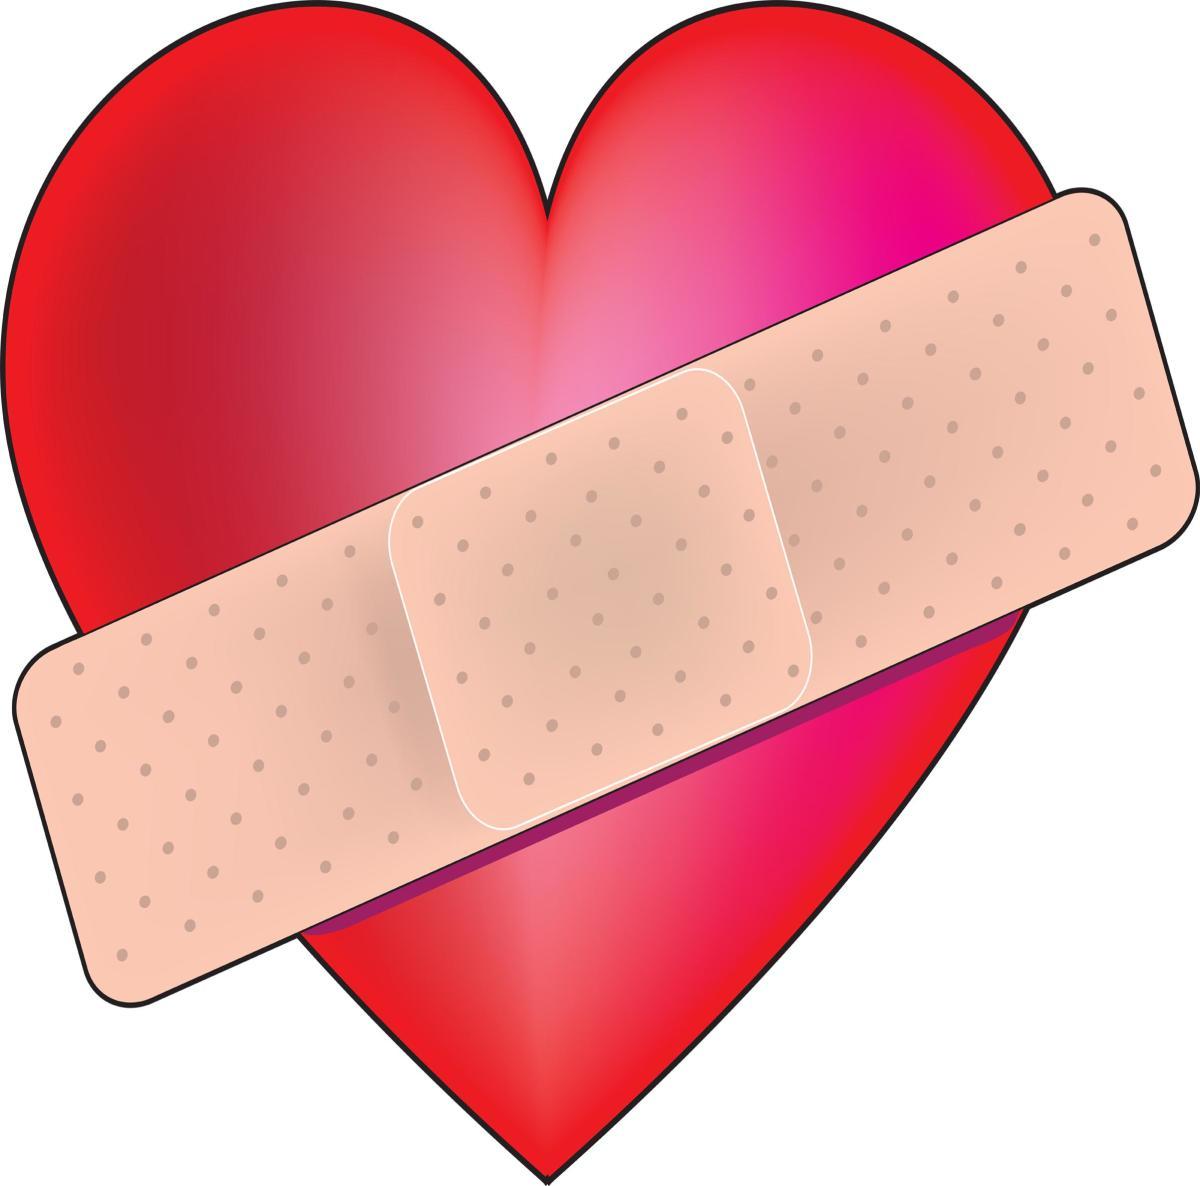 Bruised Heart Image